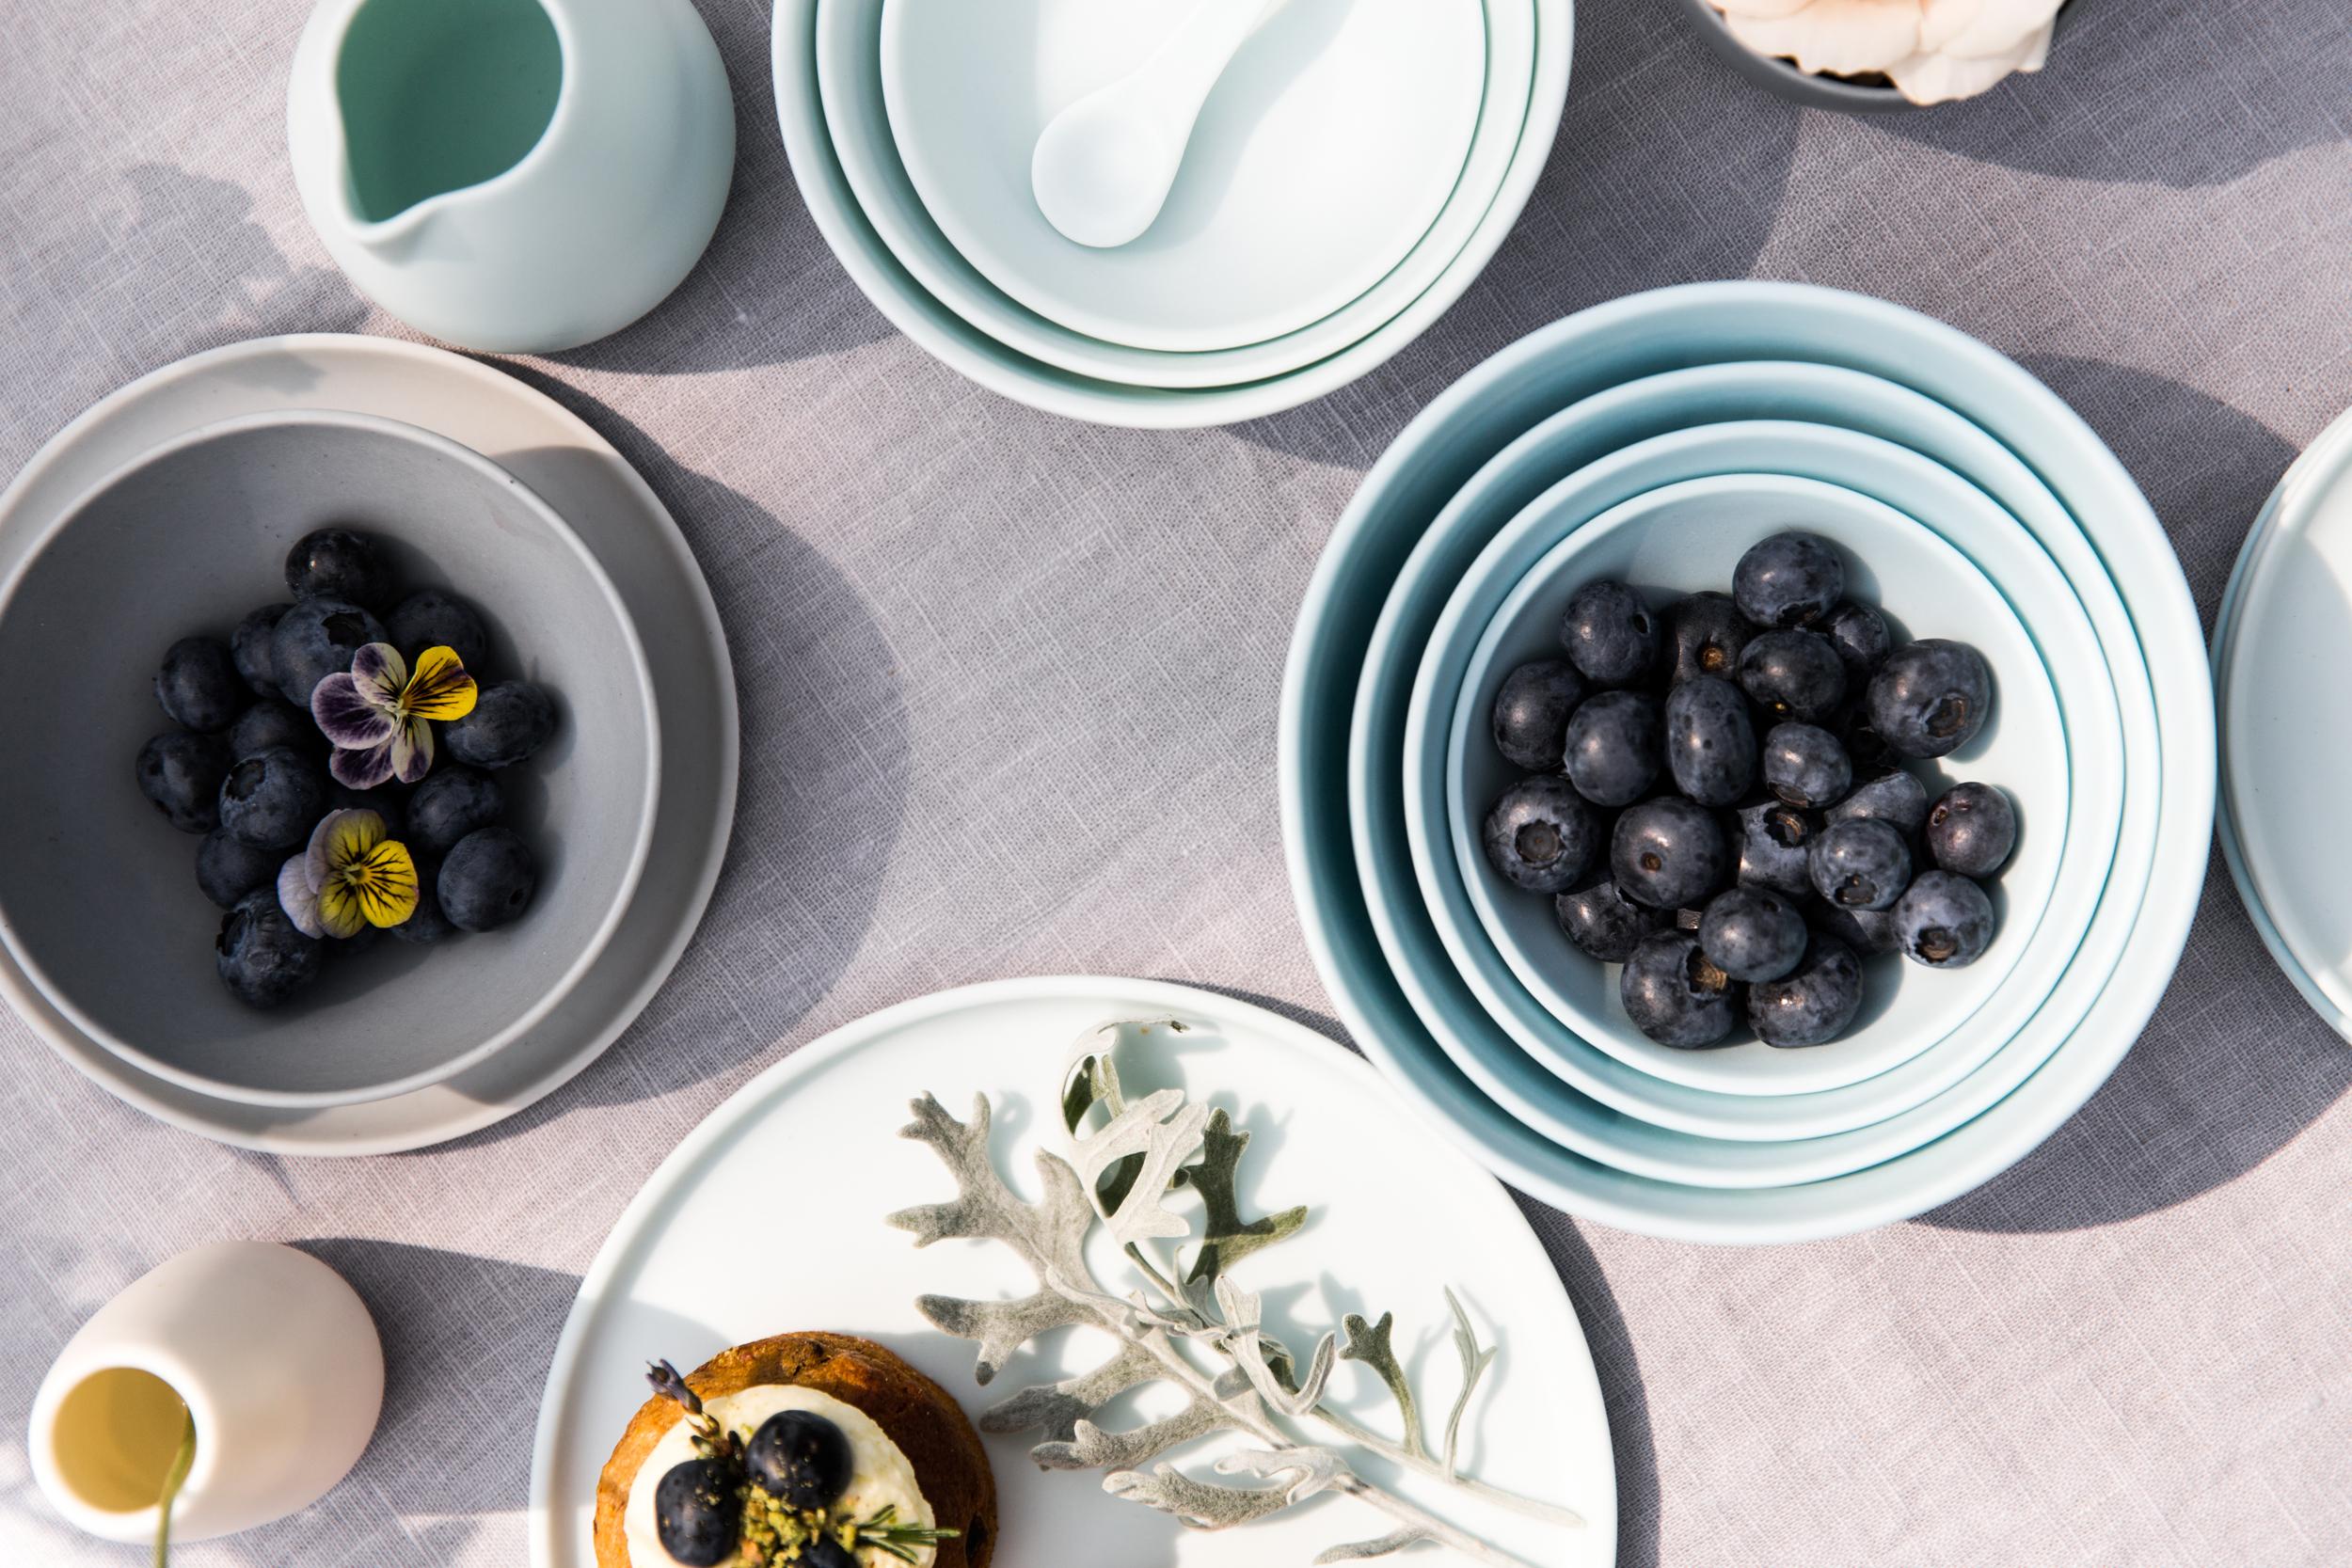 Porcelain Collection -